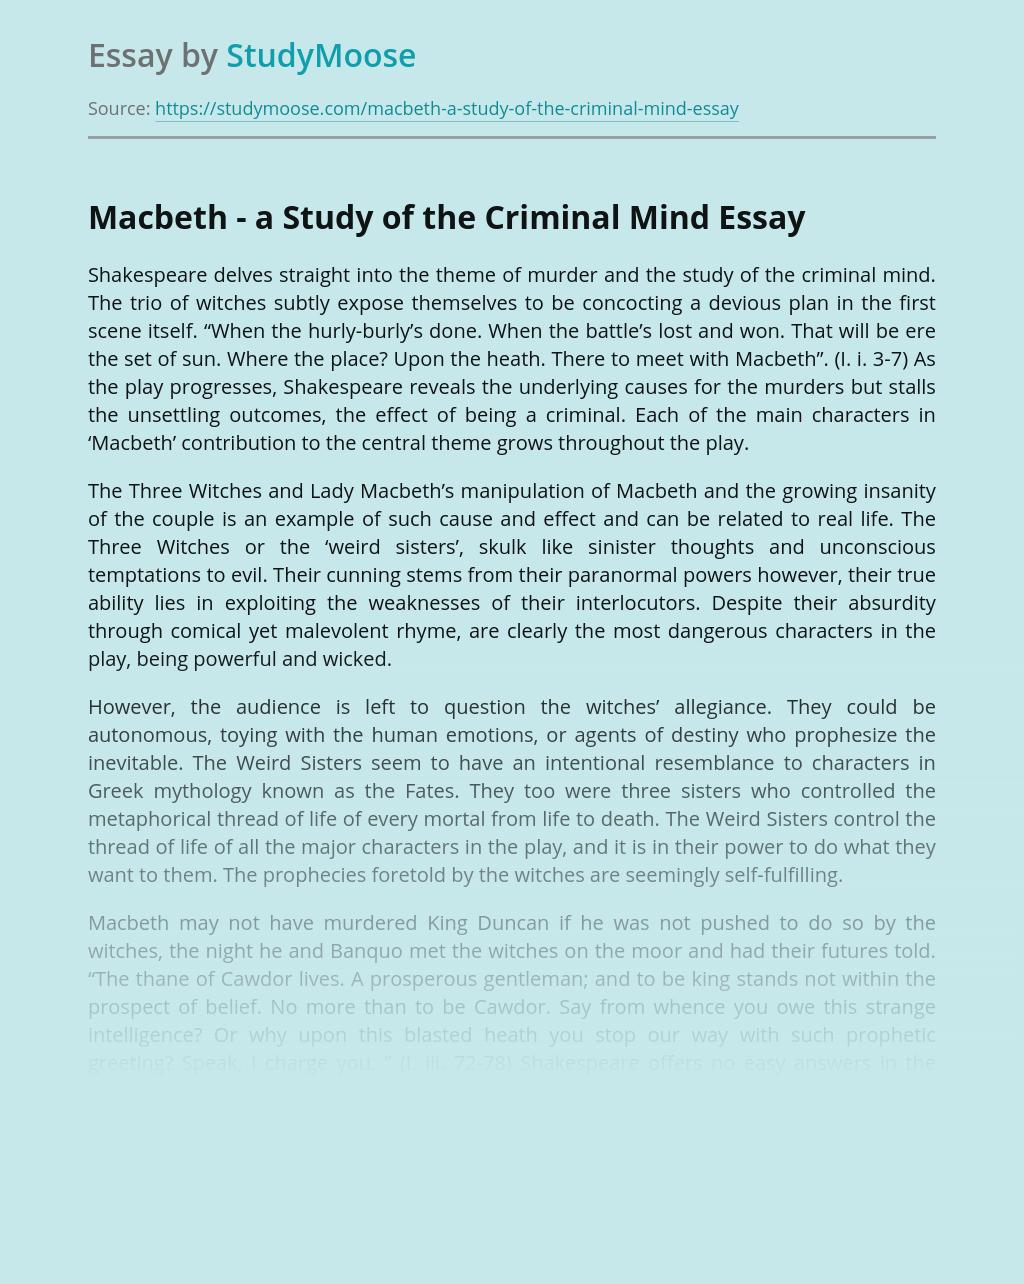 Macbeth - a Study of the Criminal Mind